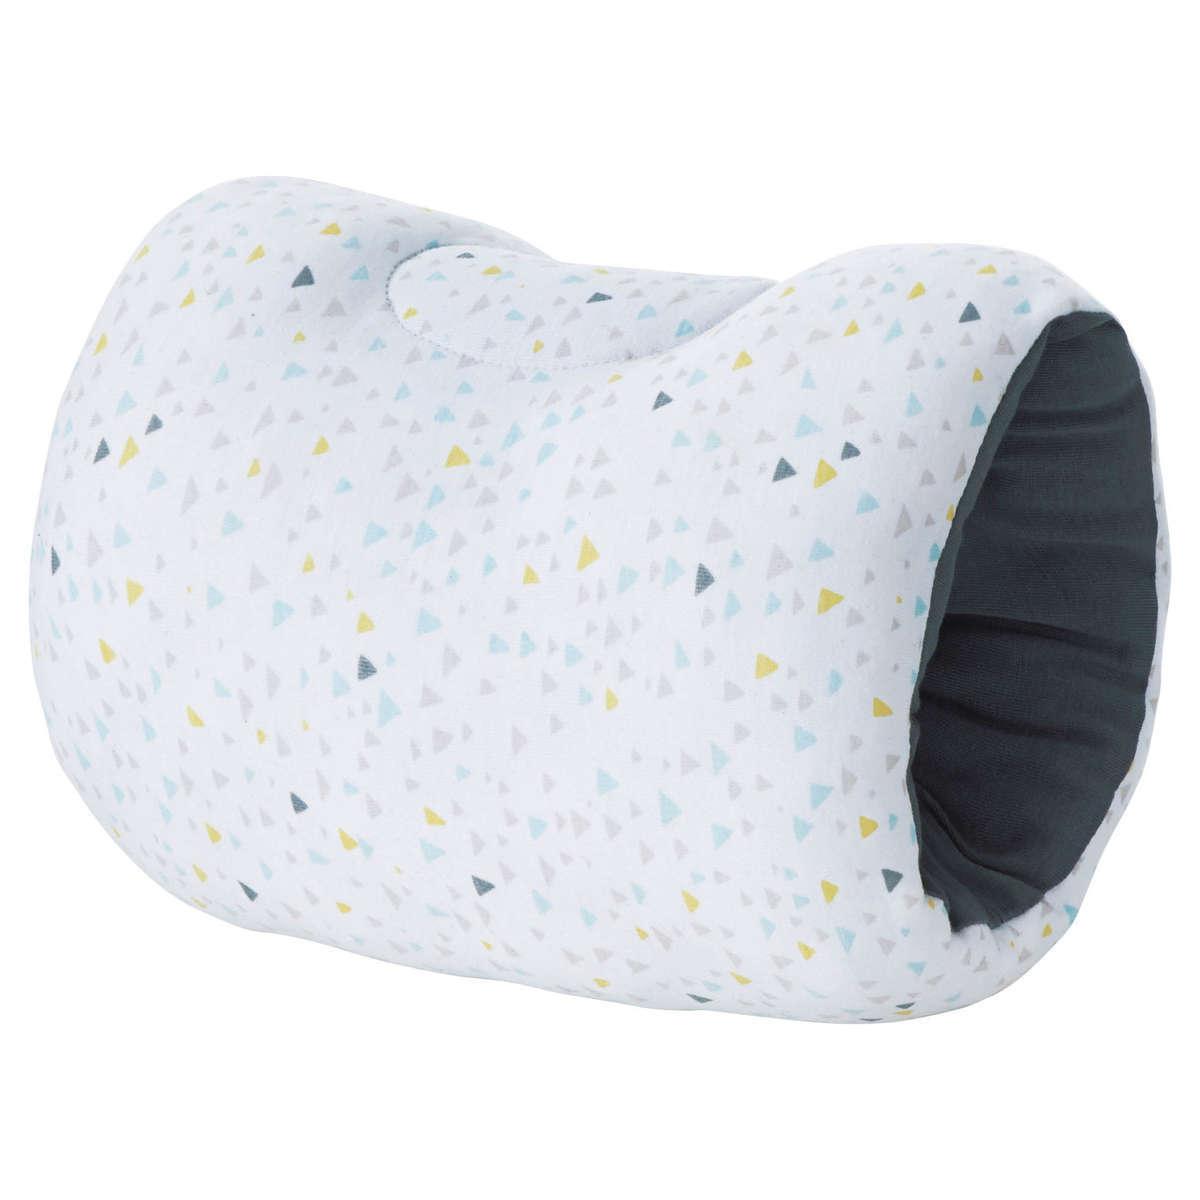 candide brassard d 39 allaitement en jersey triangles multicolores coussin allaitement candide. Black Bedroom Furniture Sets. Home Design Ideas